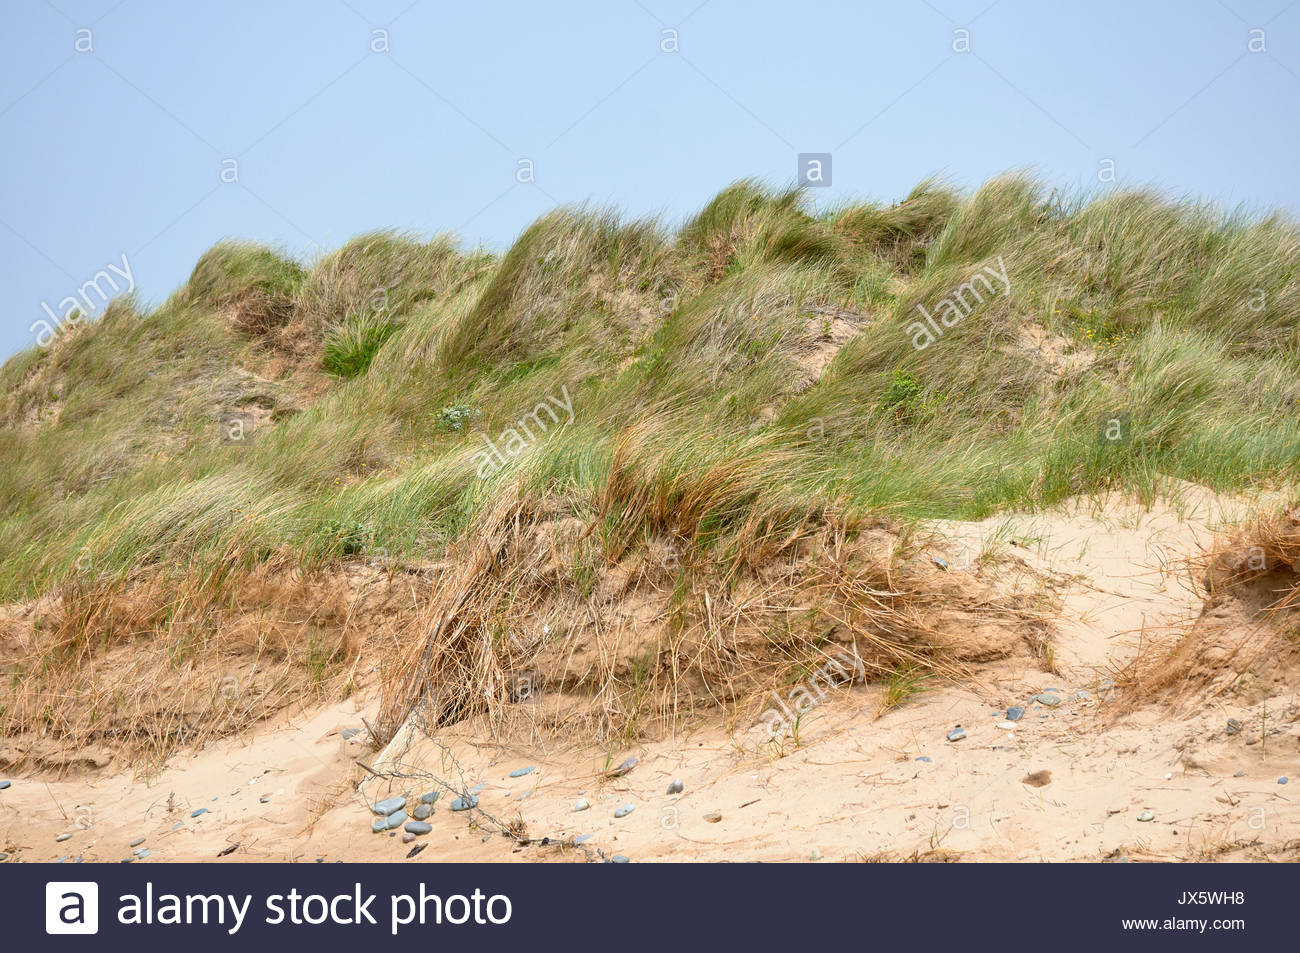 Marram grass ammophila arenaria on sand dunes on a british uk sandy beach - Stock Image